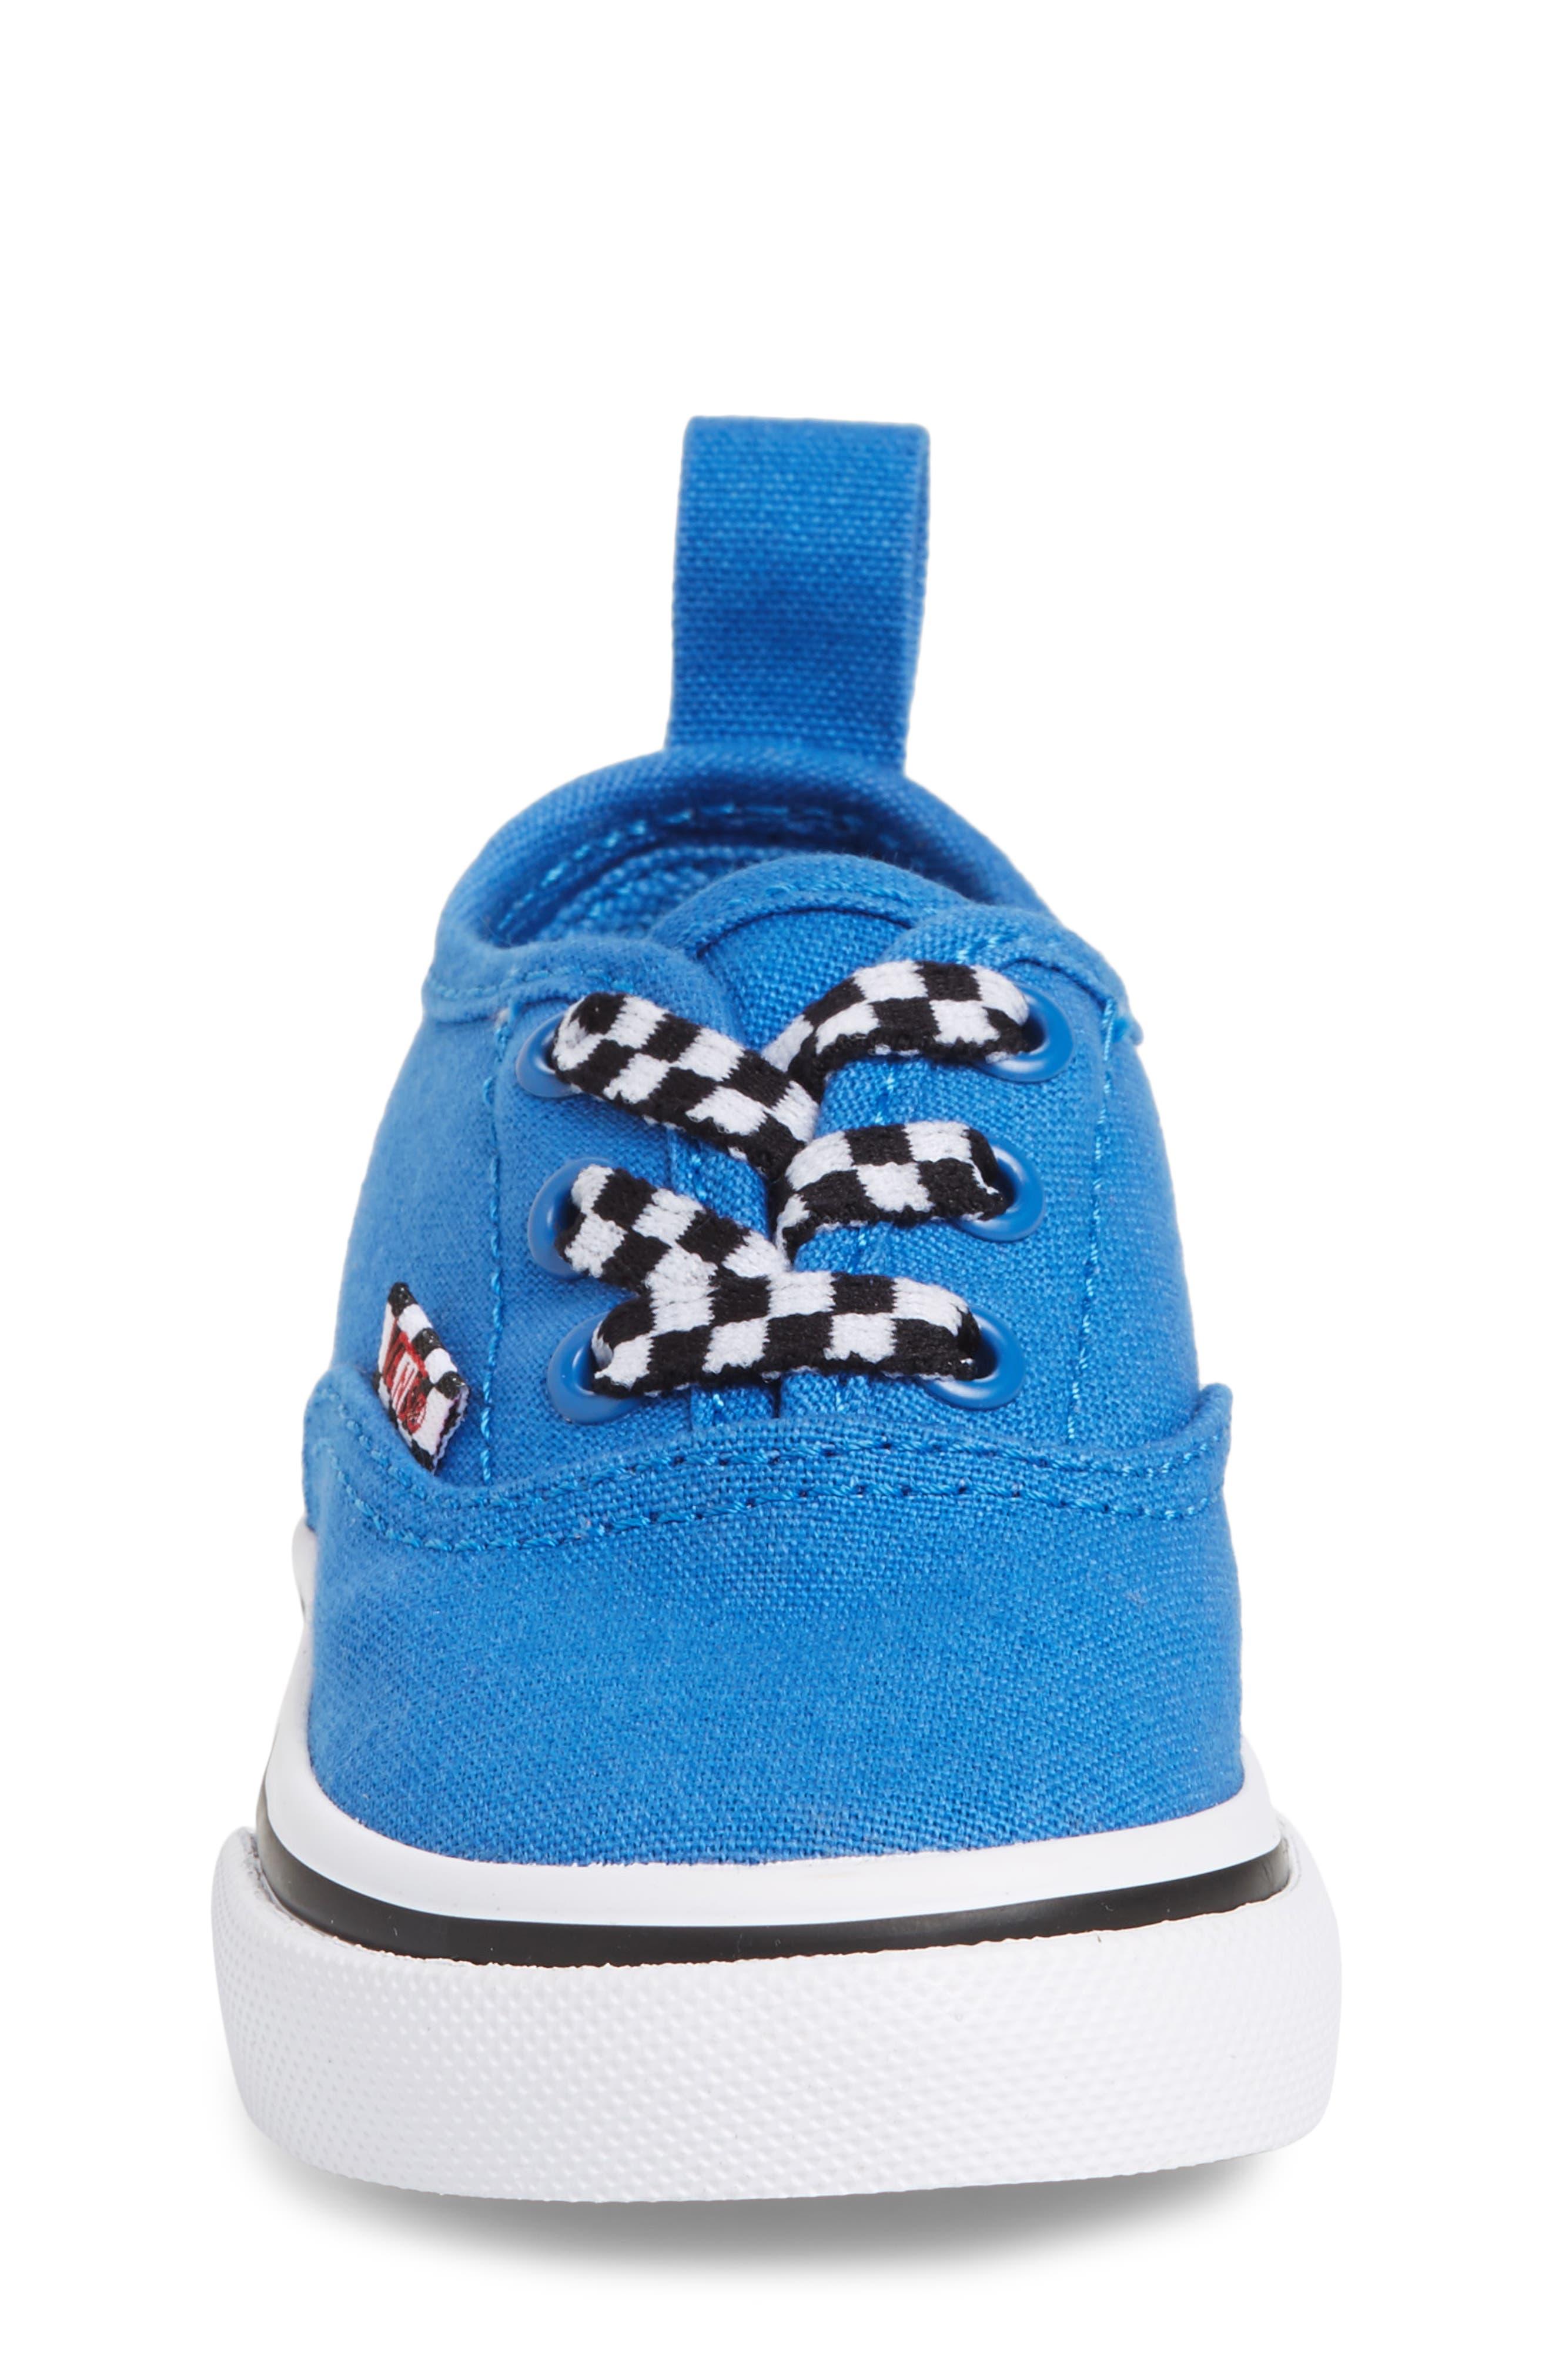 Authentic Sneaker,                             Alternate thumbnail 4, color,                             Blue/ White Check Lace